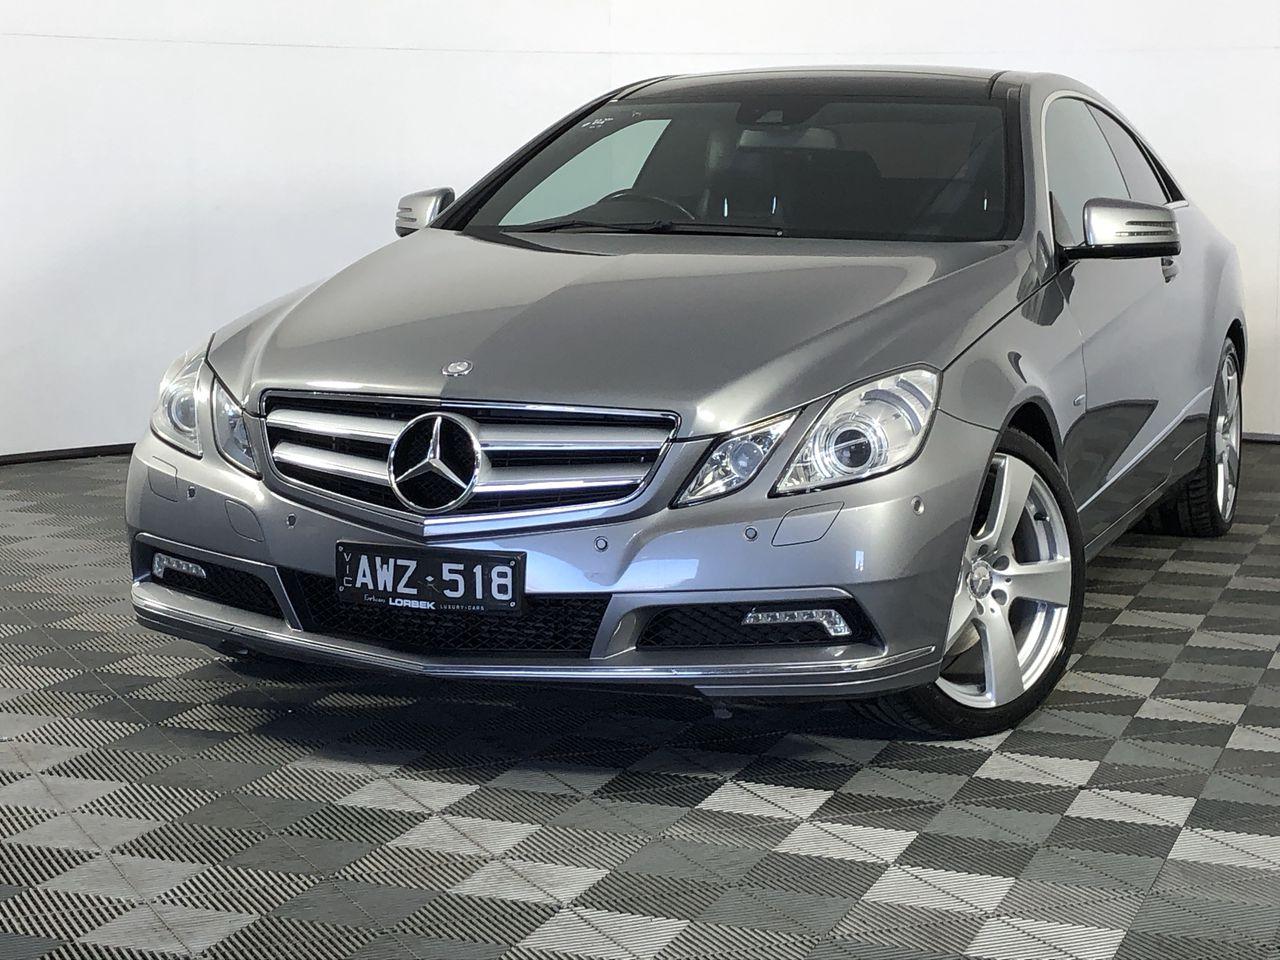 2010 Mercedes Benz E250 CDI Elegance C207 Turbo Diesel Automatic Coupe